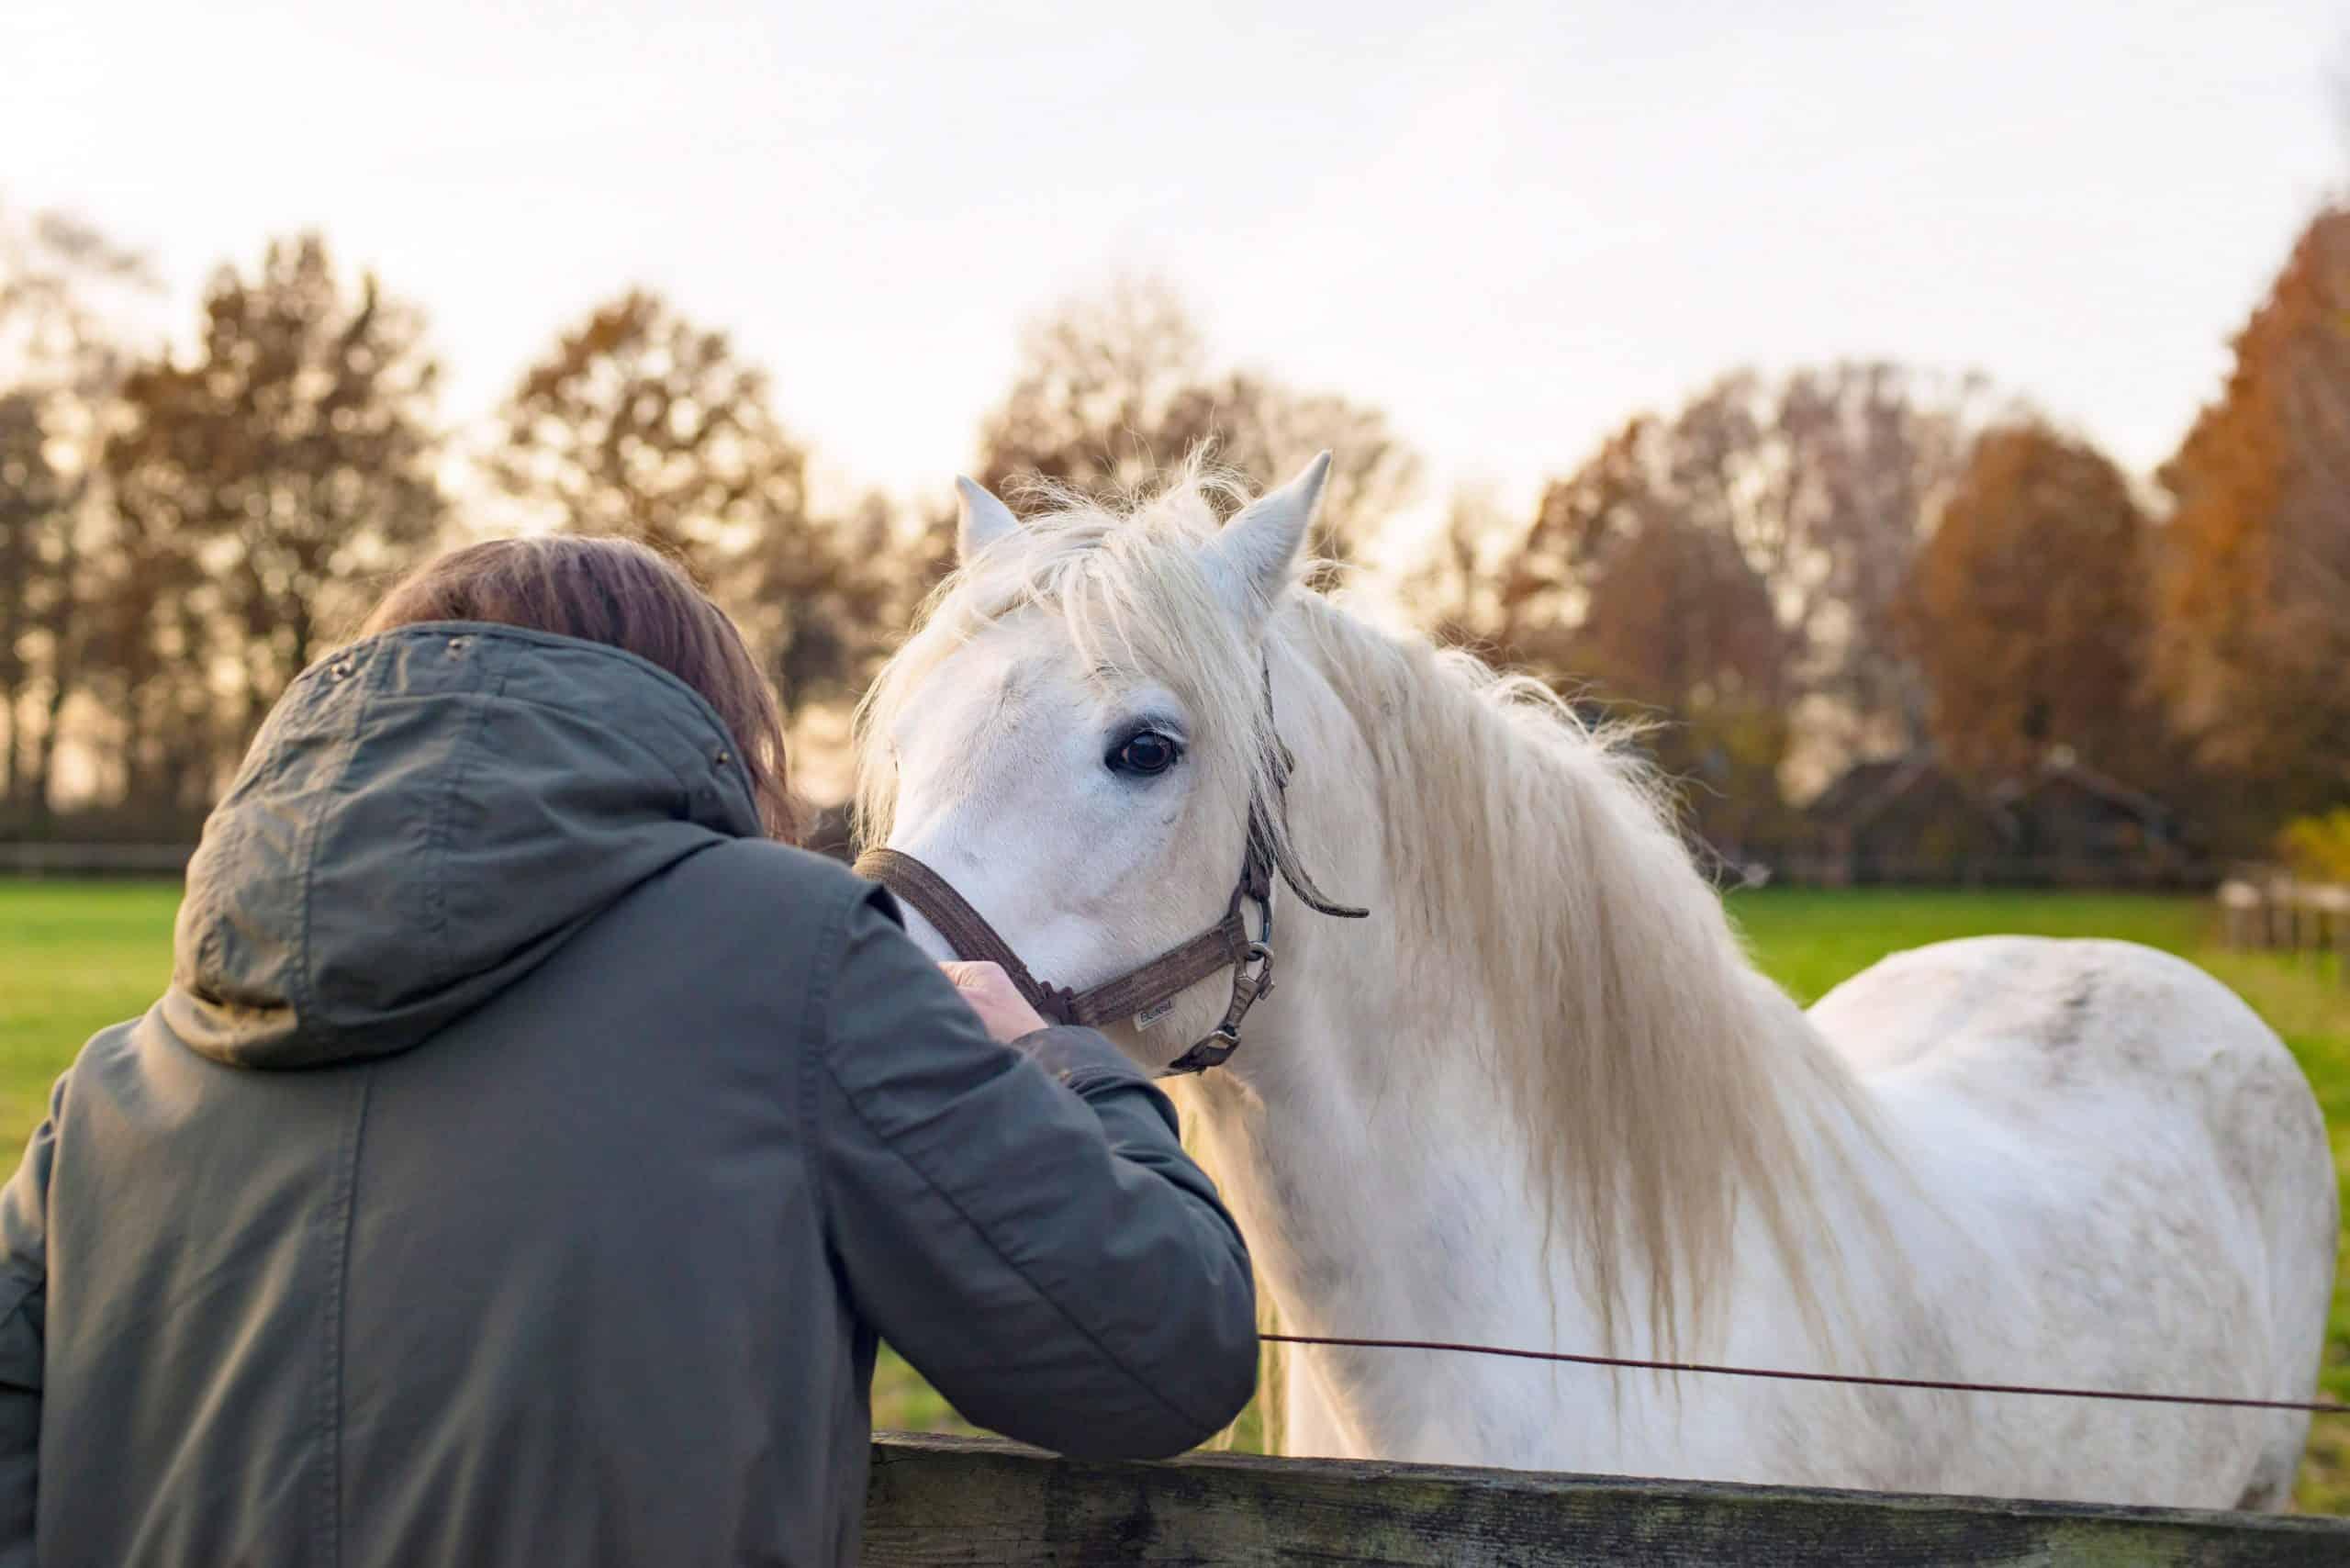 Brunette woman hugging white pony near fence. Rear view.